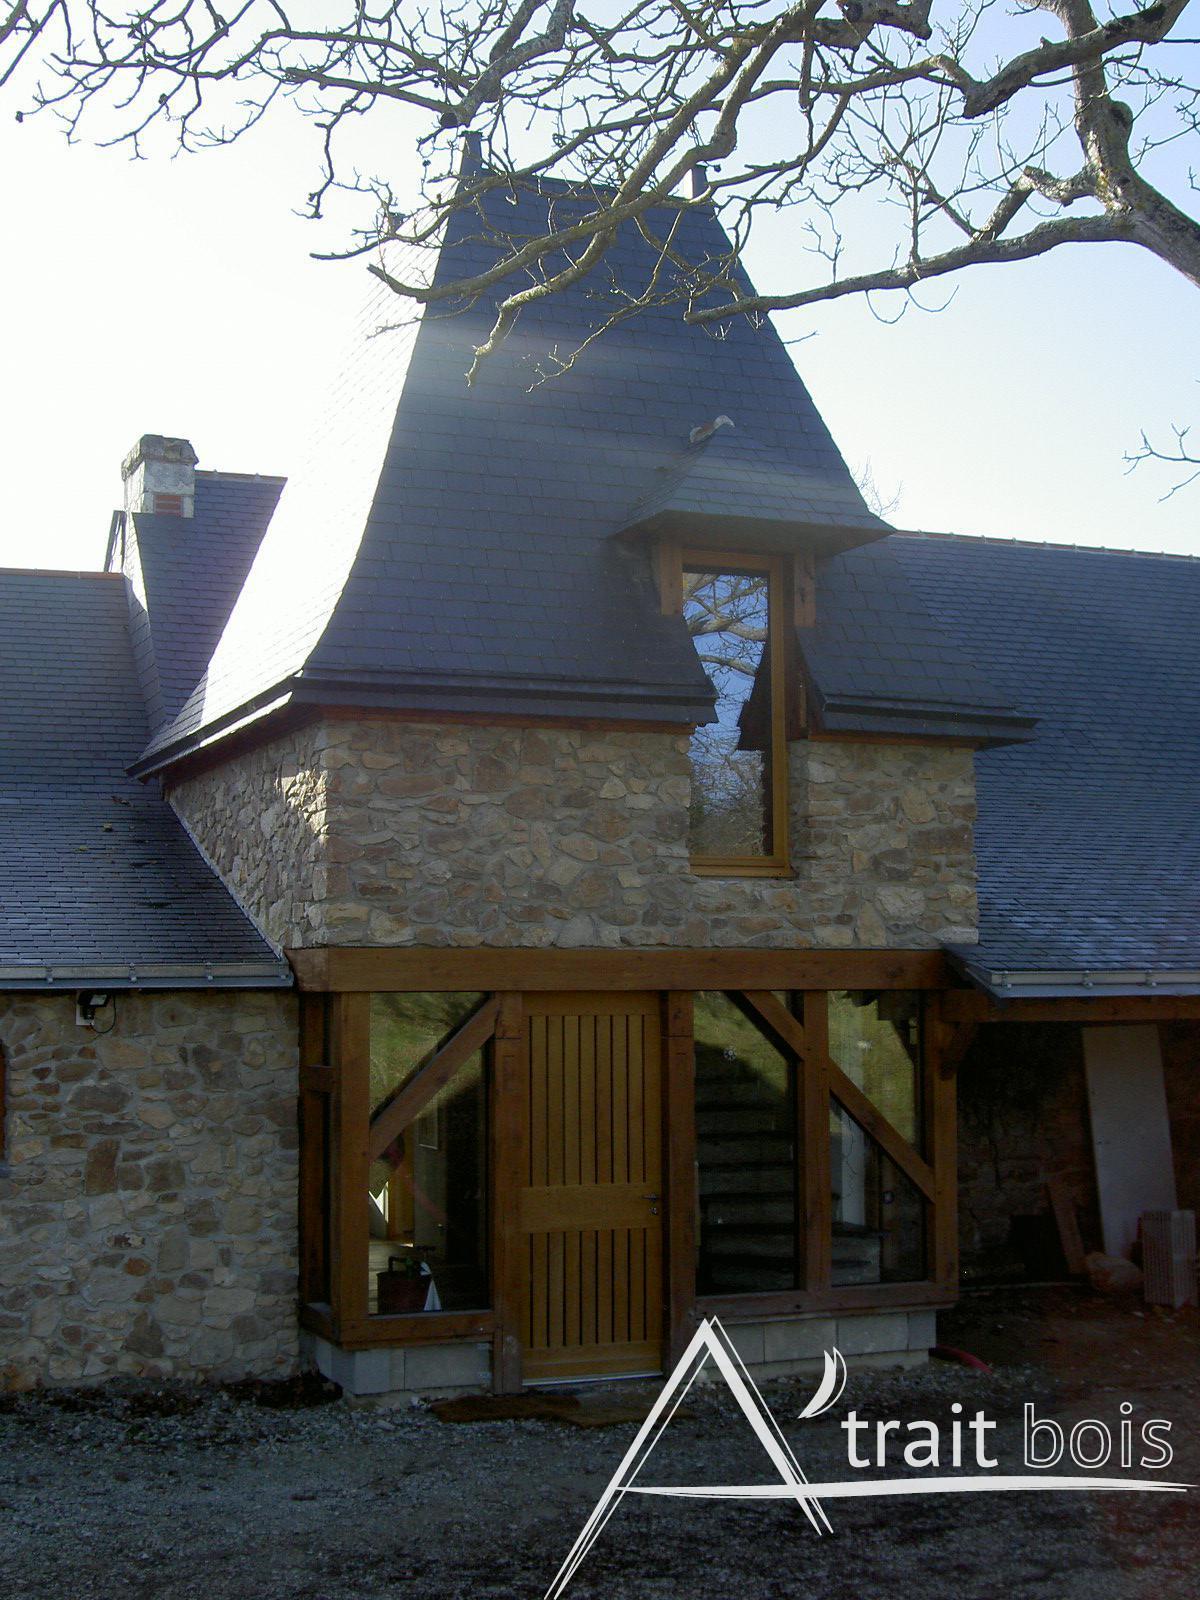 Charpente bois Angers, MaineetLoire (49)